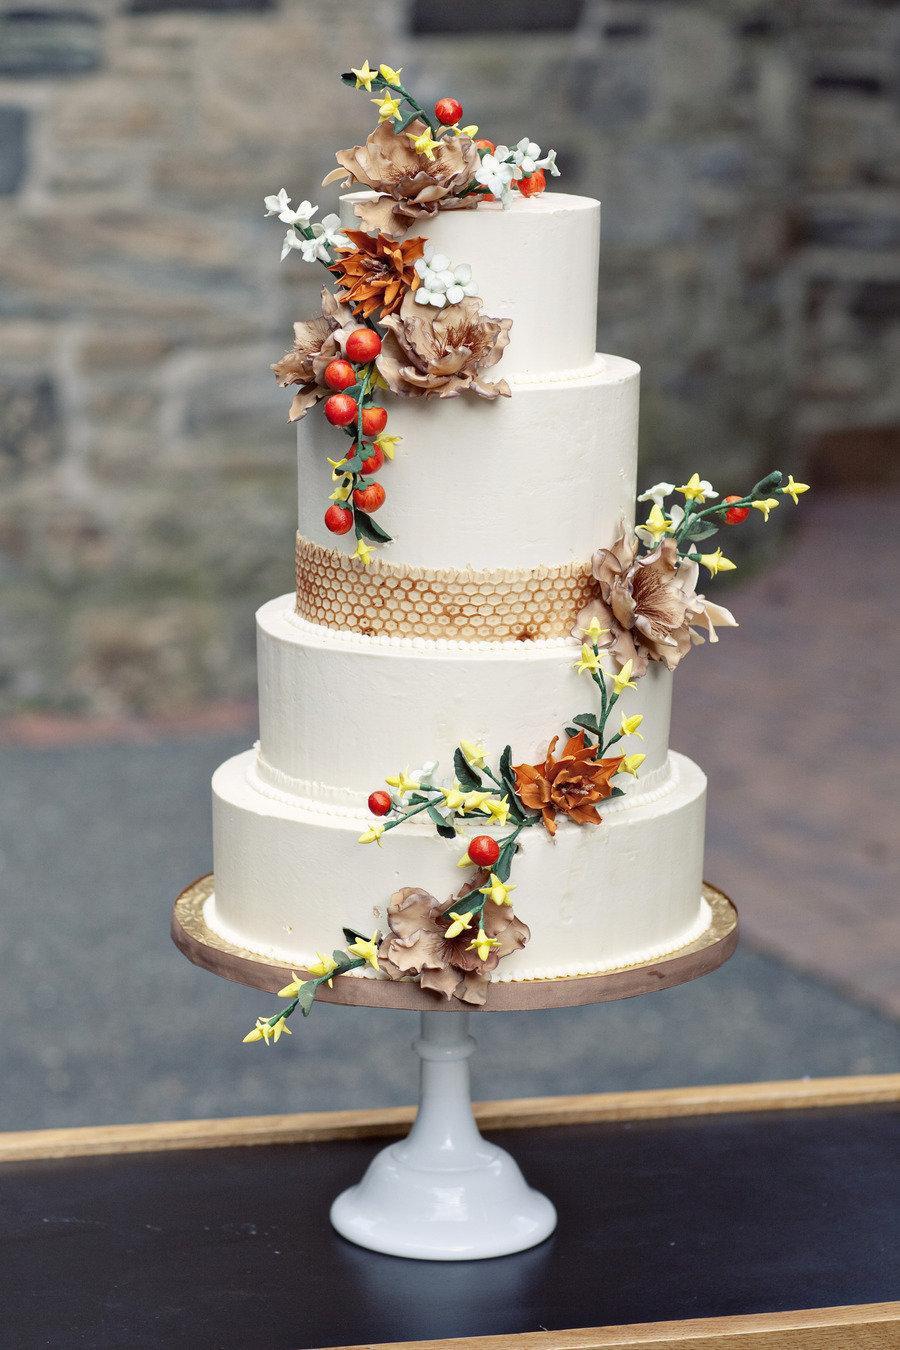 Different Wedding Cakes  Delightful Wedding Cake Ideas With Unique Details Weddbook